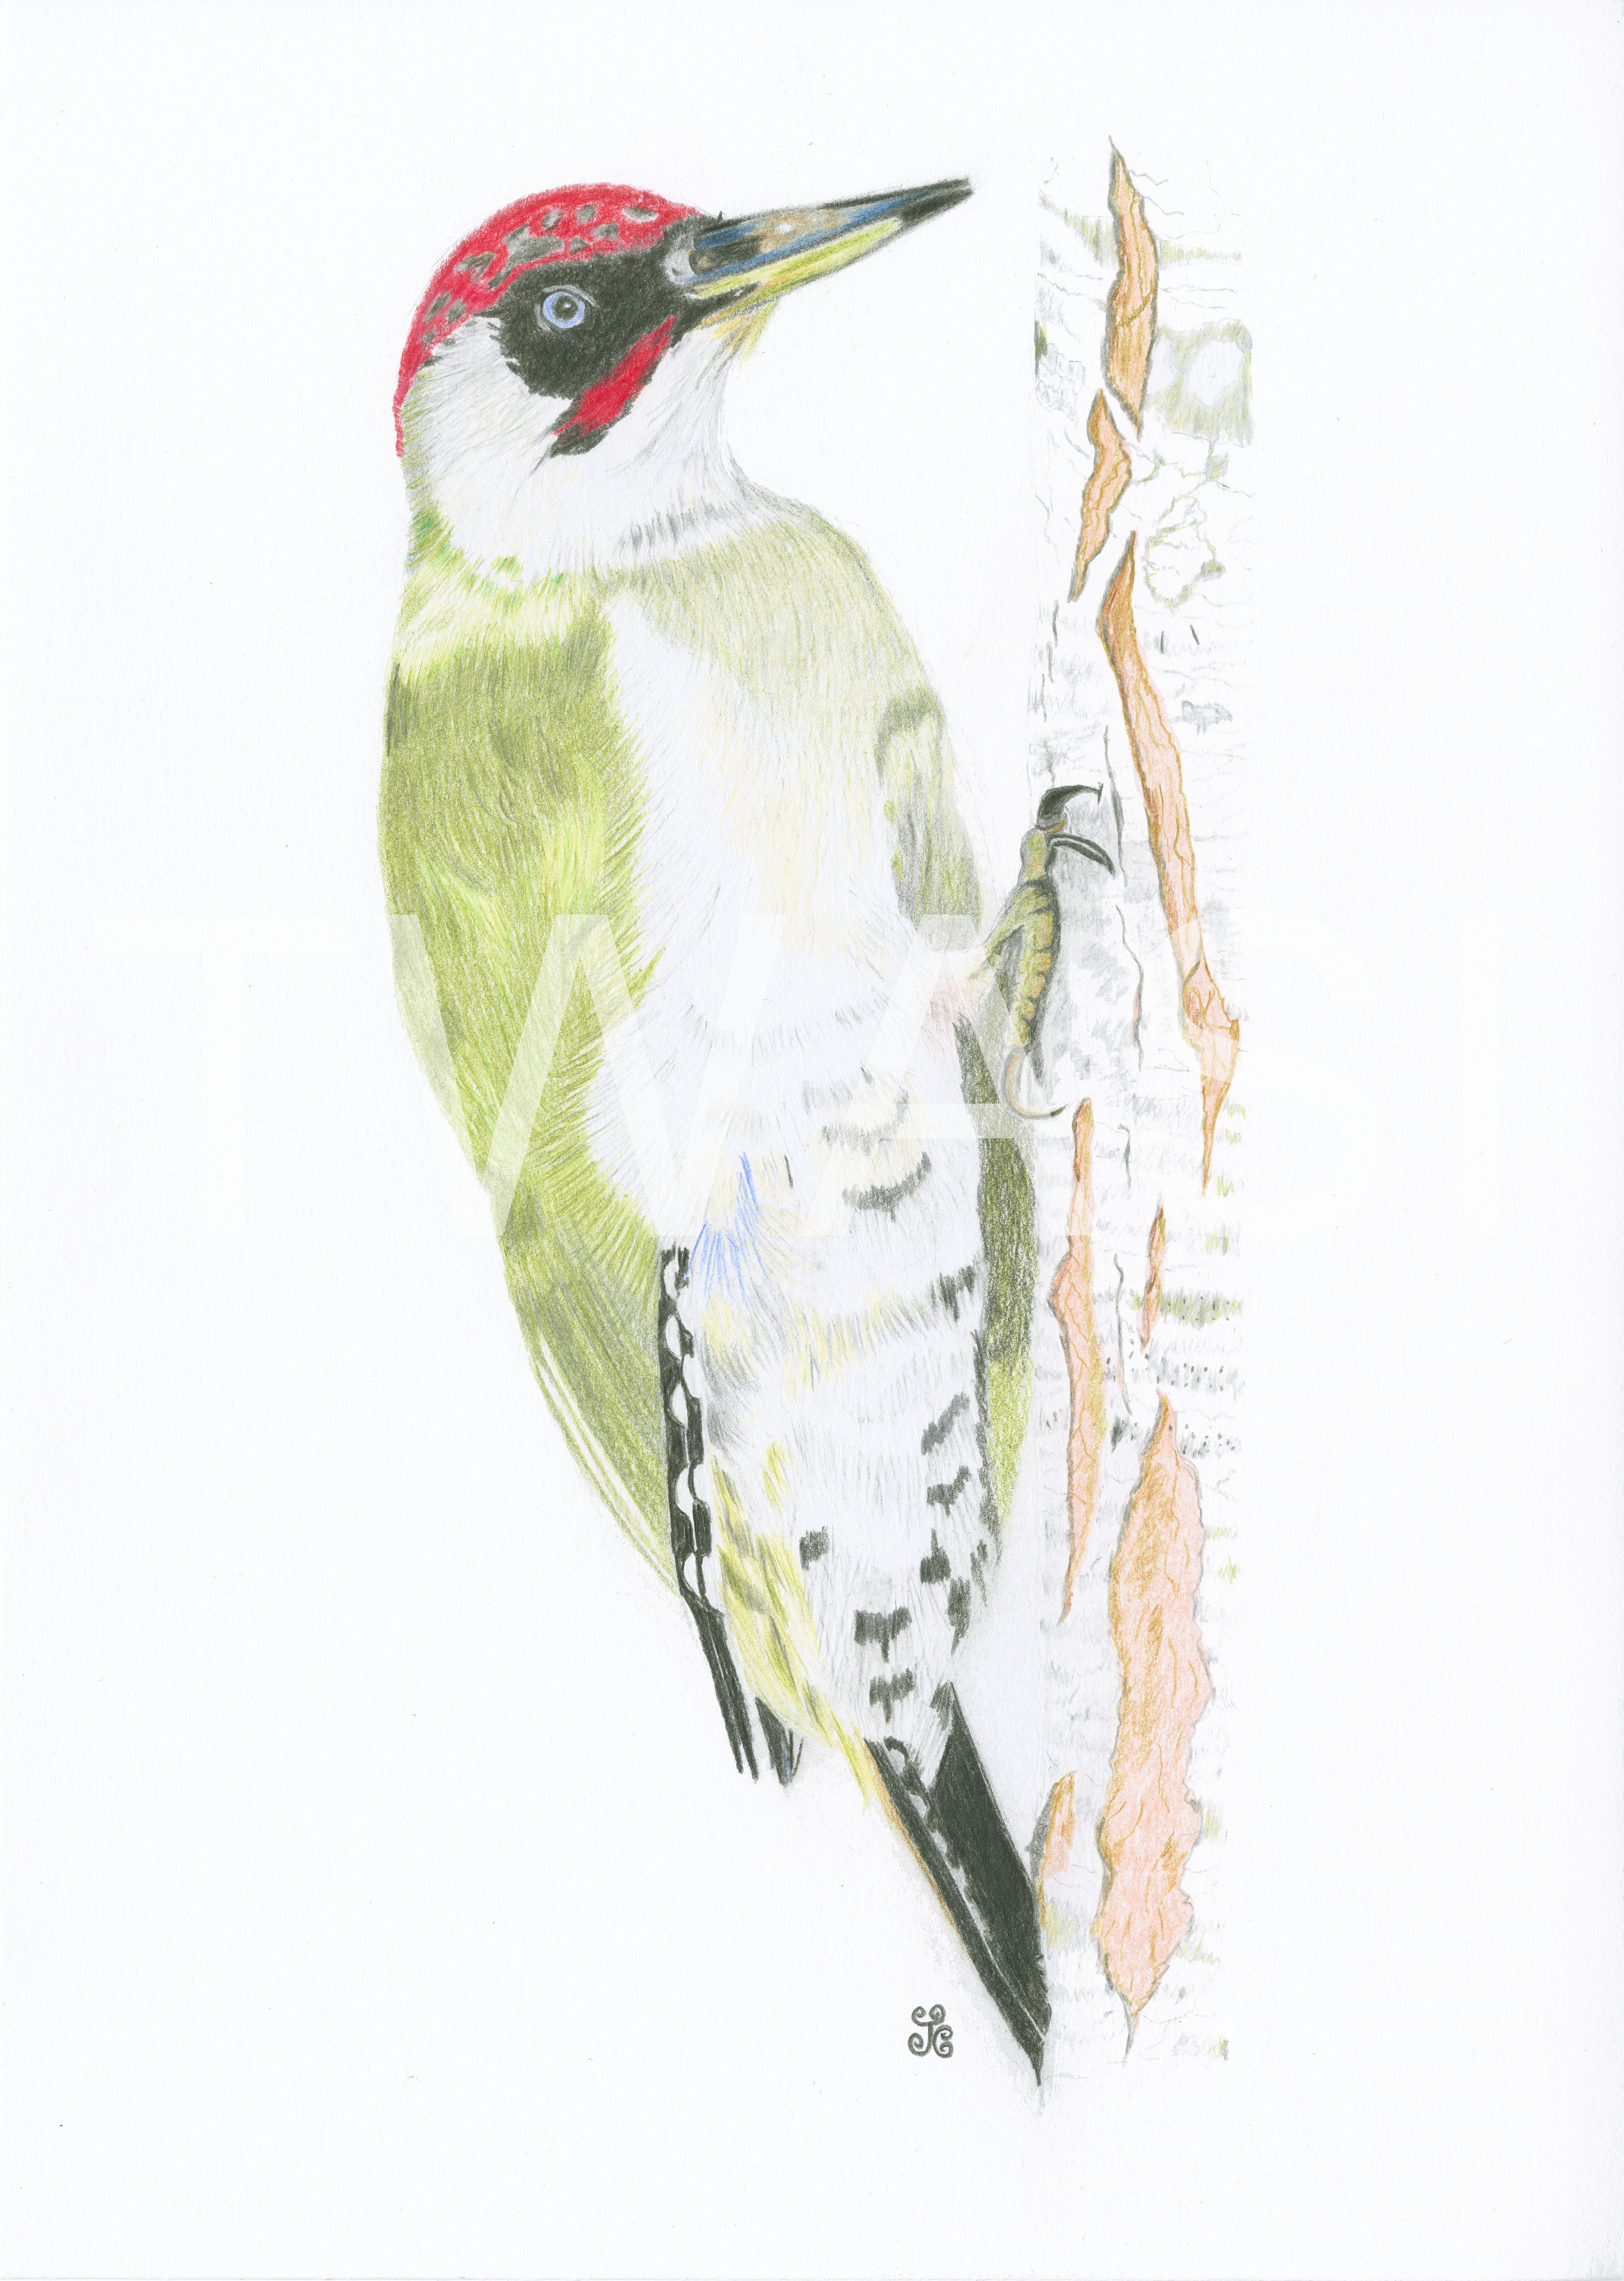 'Triumphant Green Woodpecker by Jules Chabeaux Polychromos Pencils (Original) 21 x 29.7 cm (Mounted) £120